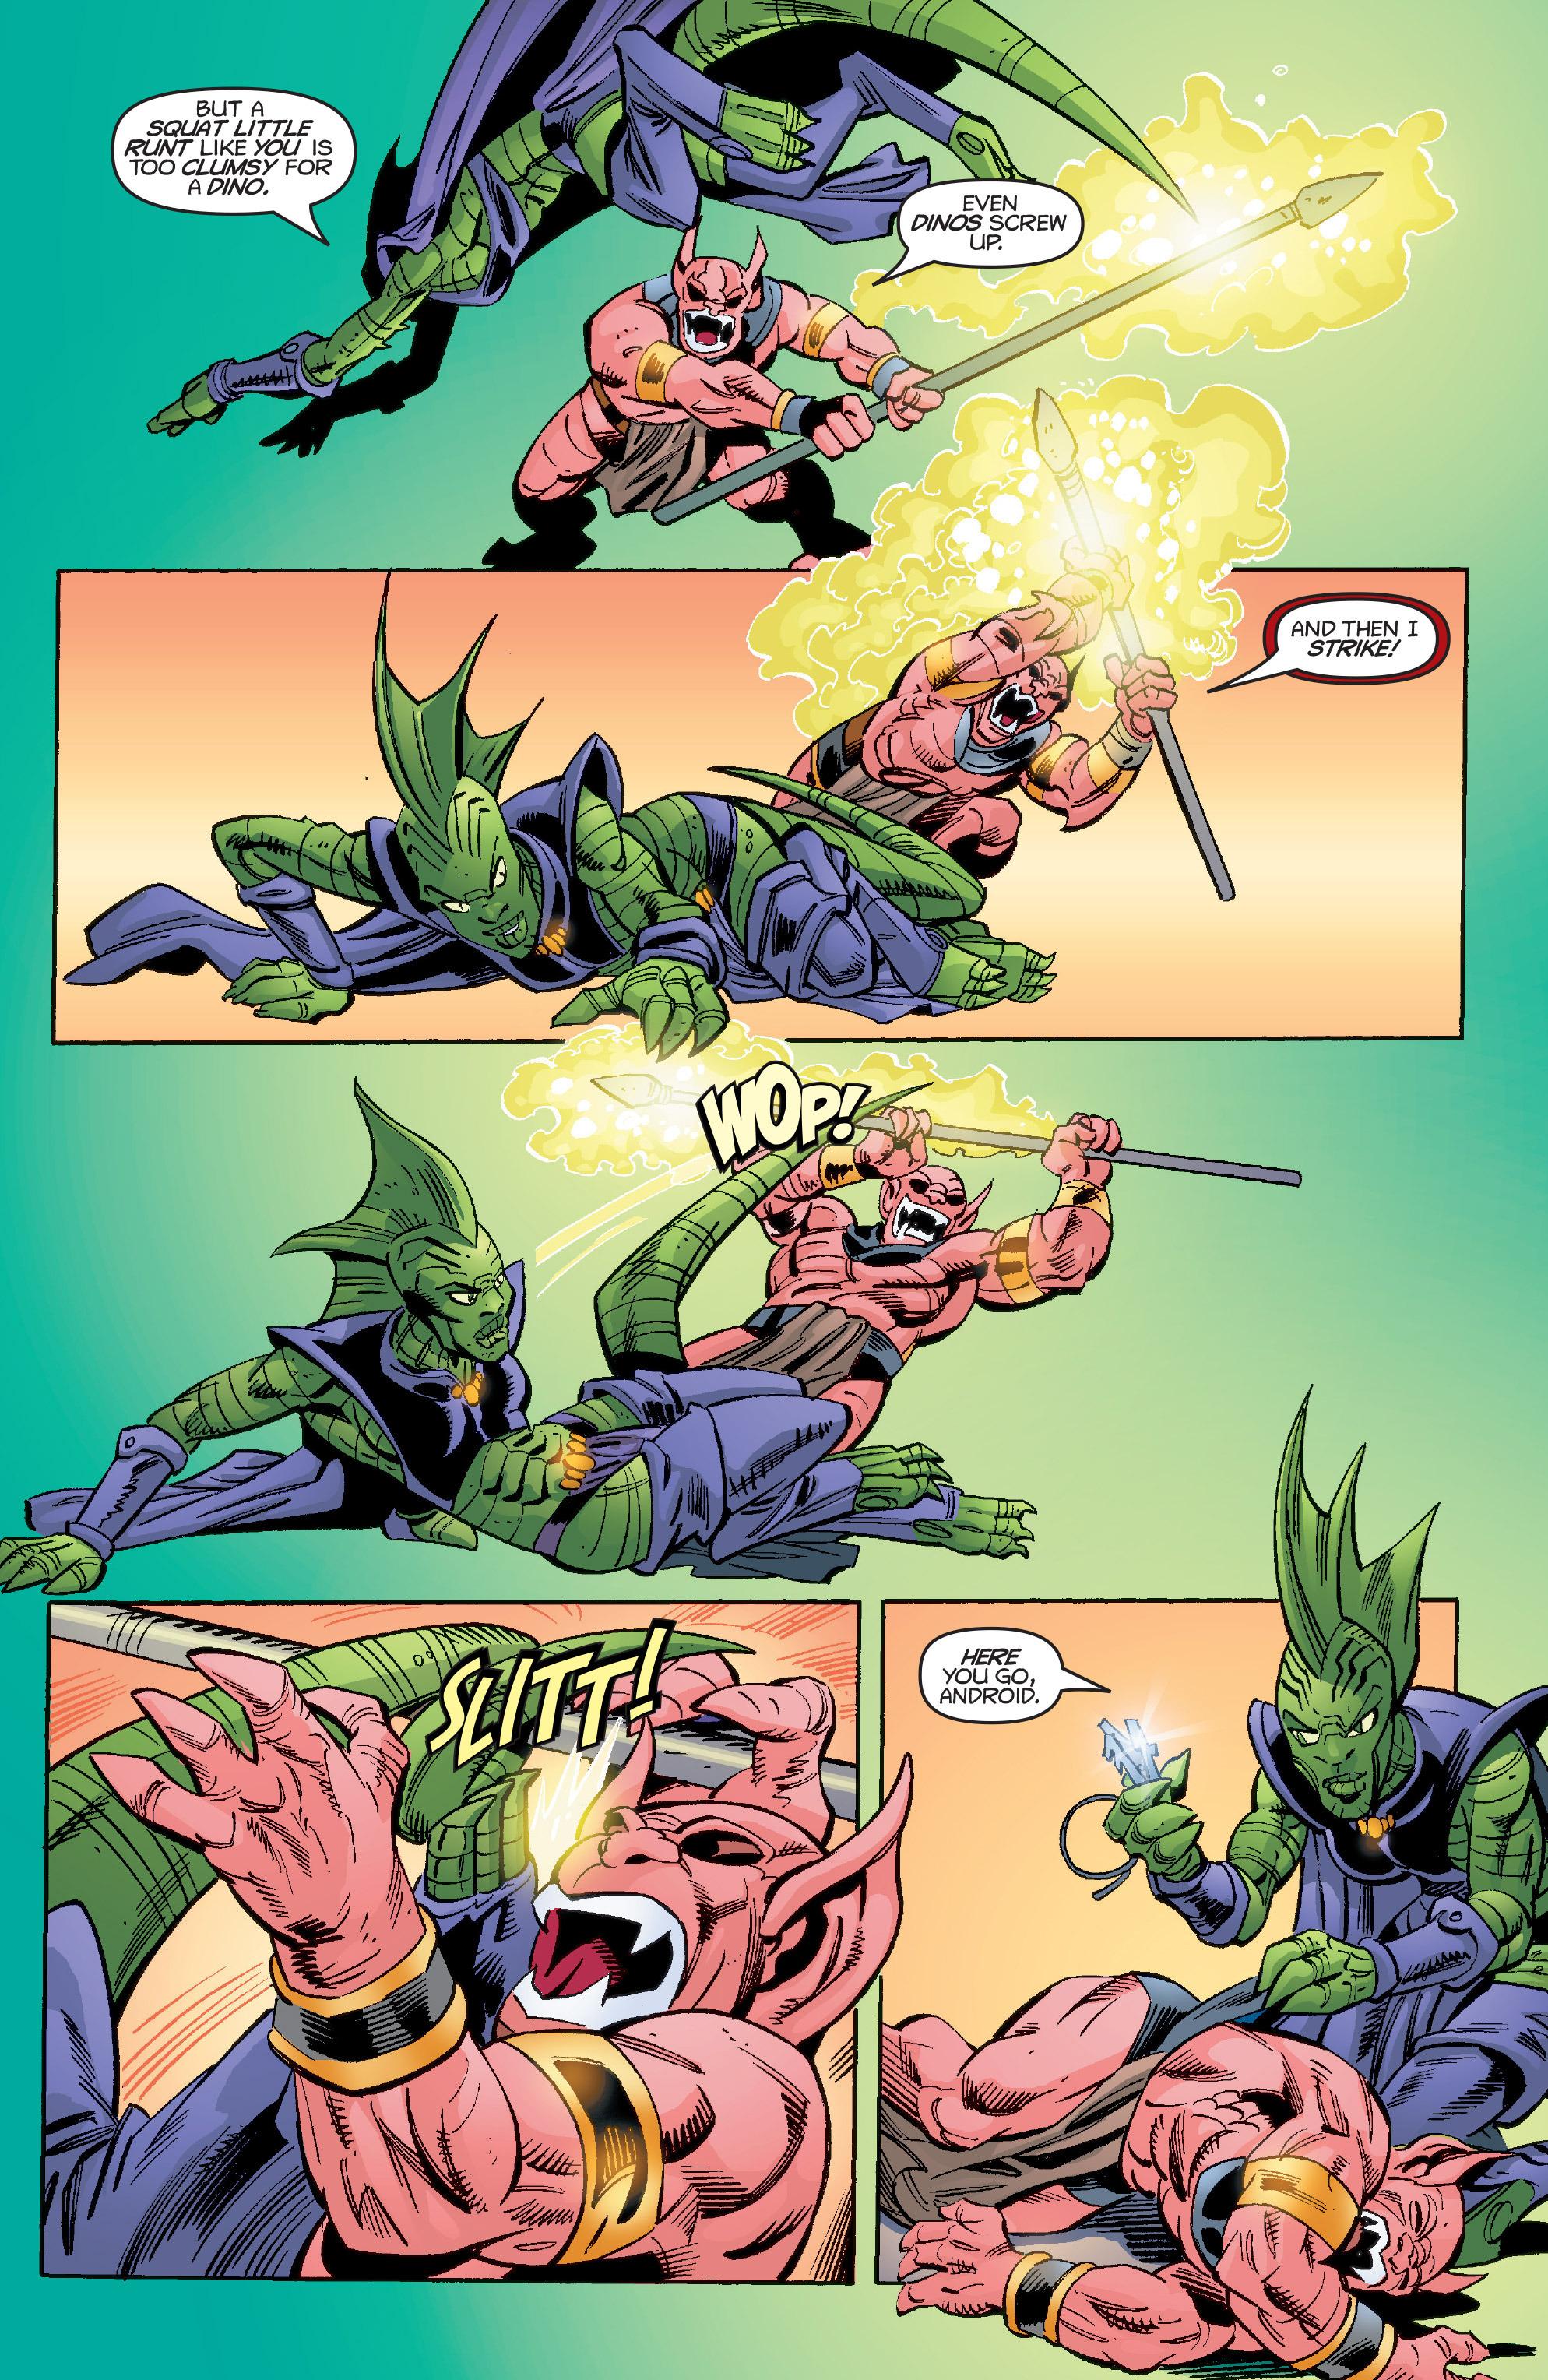 Avengers Celestial Quest Issue 7 | Viewcomic reading comics